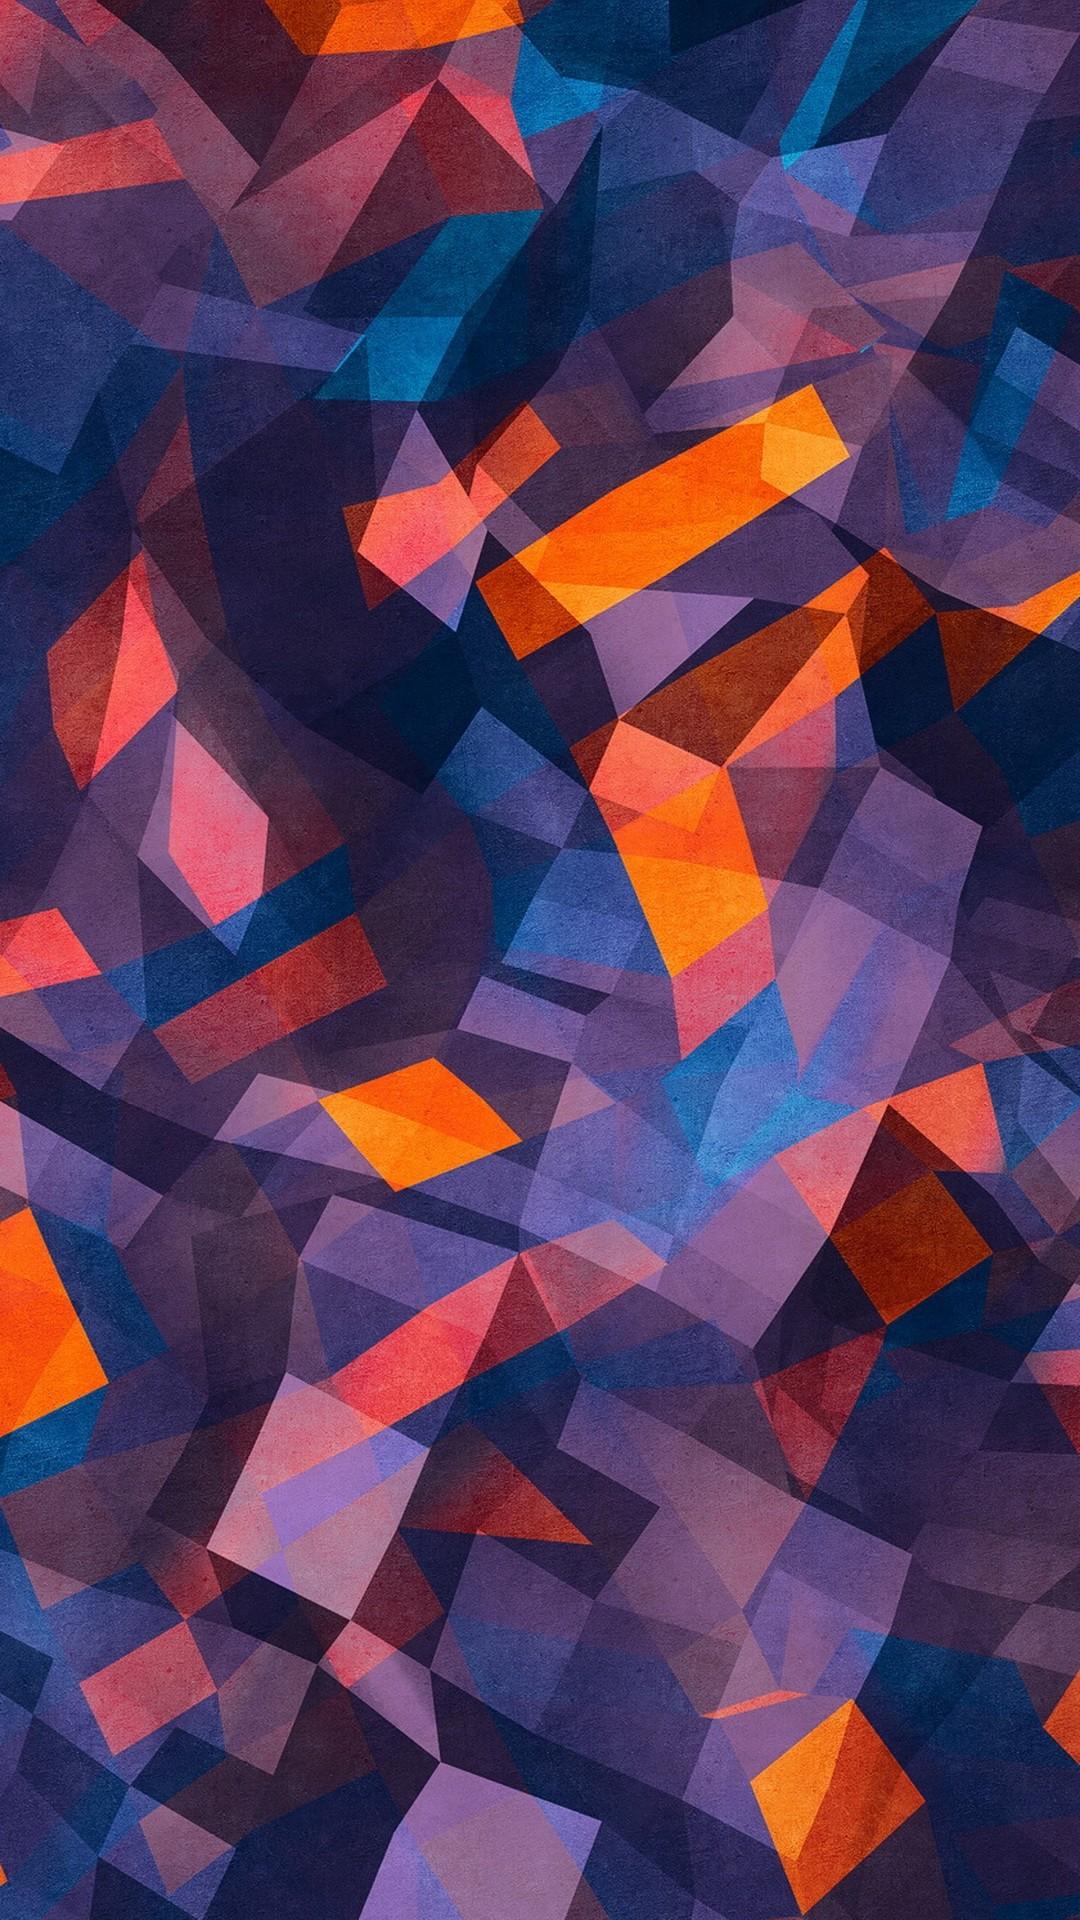 Geometric iphone 5 wallpaper